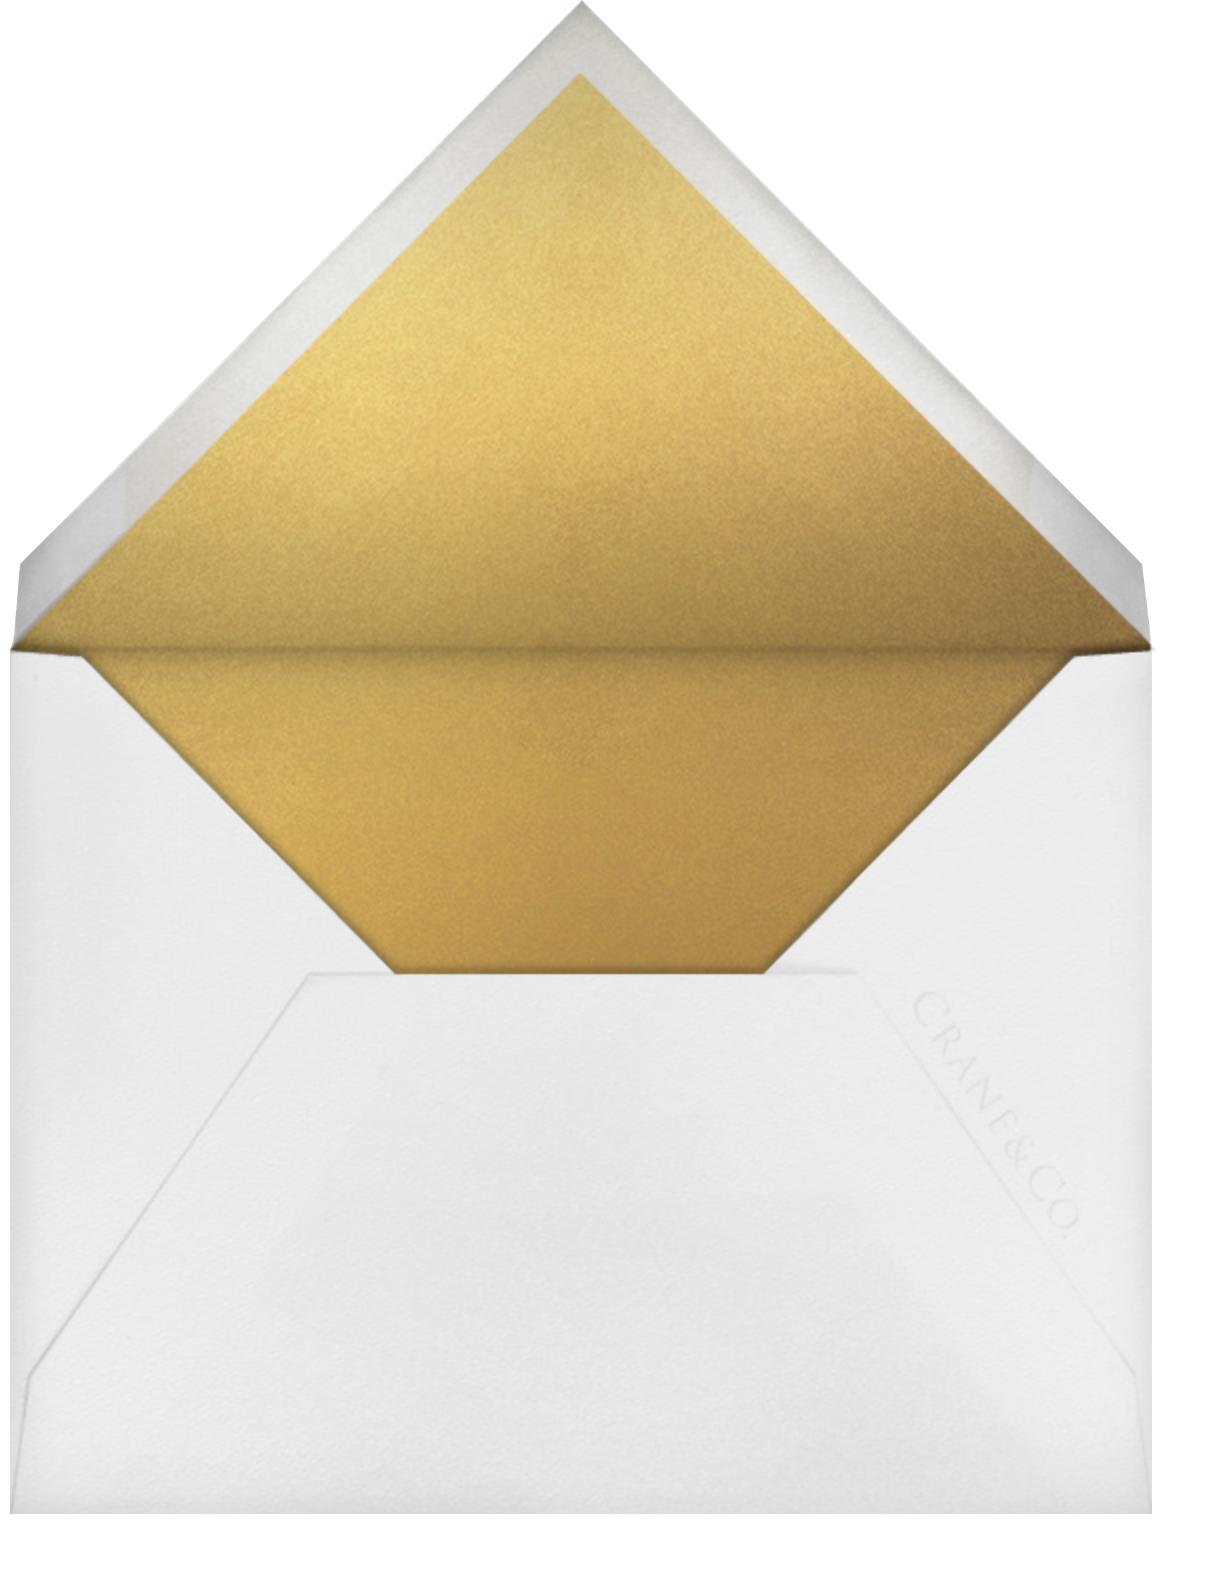 Notch - Gold - Vera Wang - Engagement party - envelope back